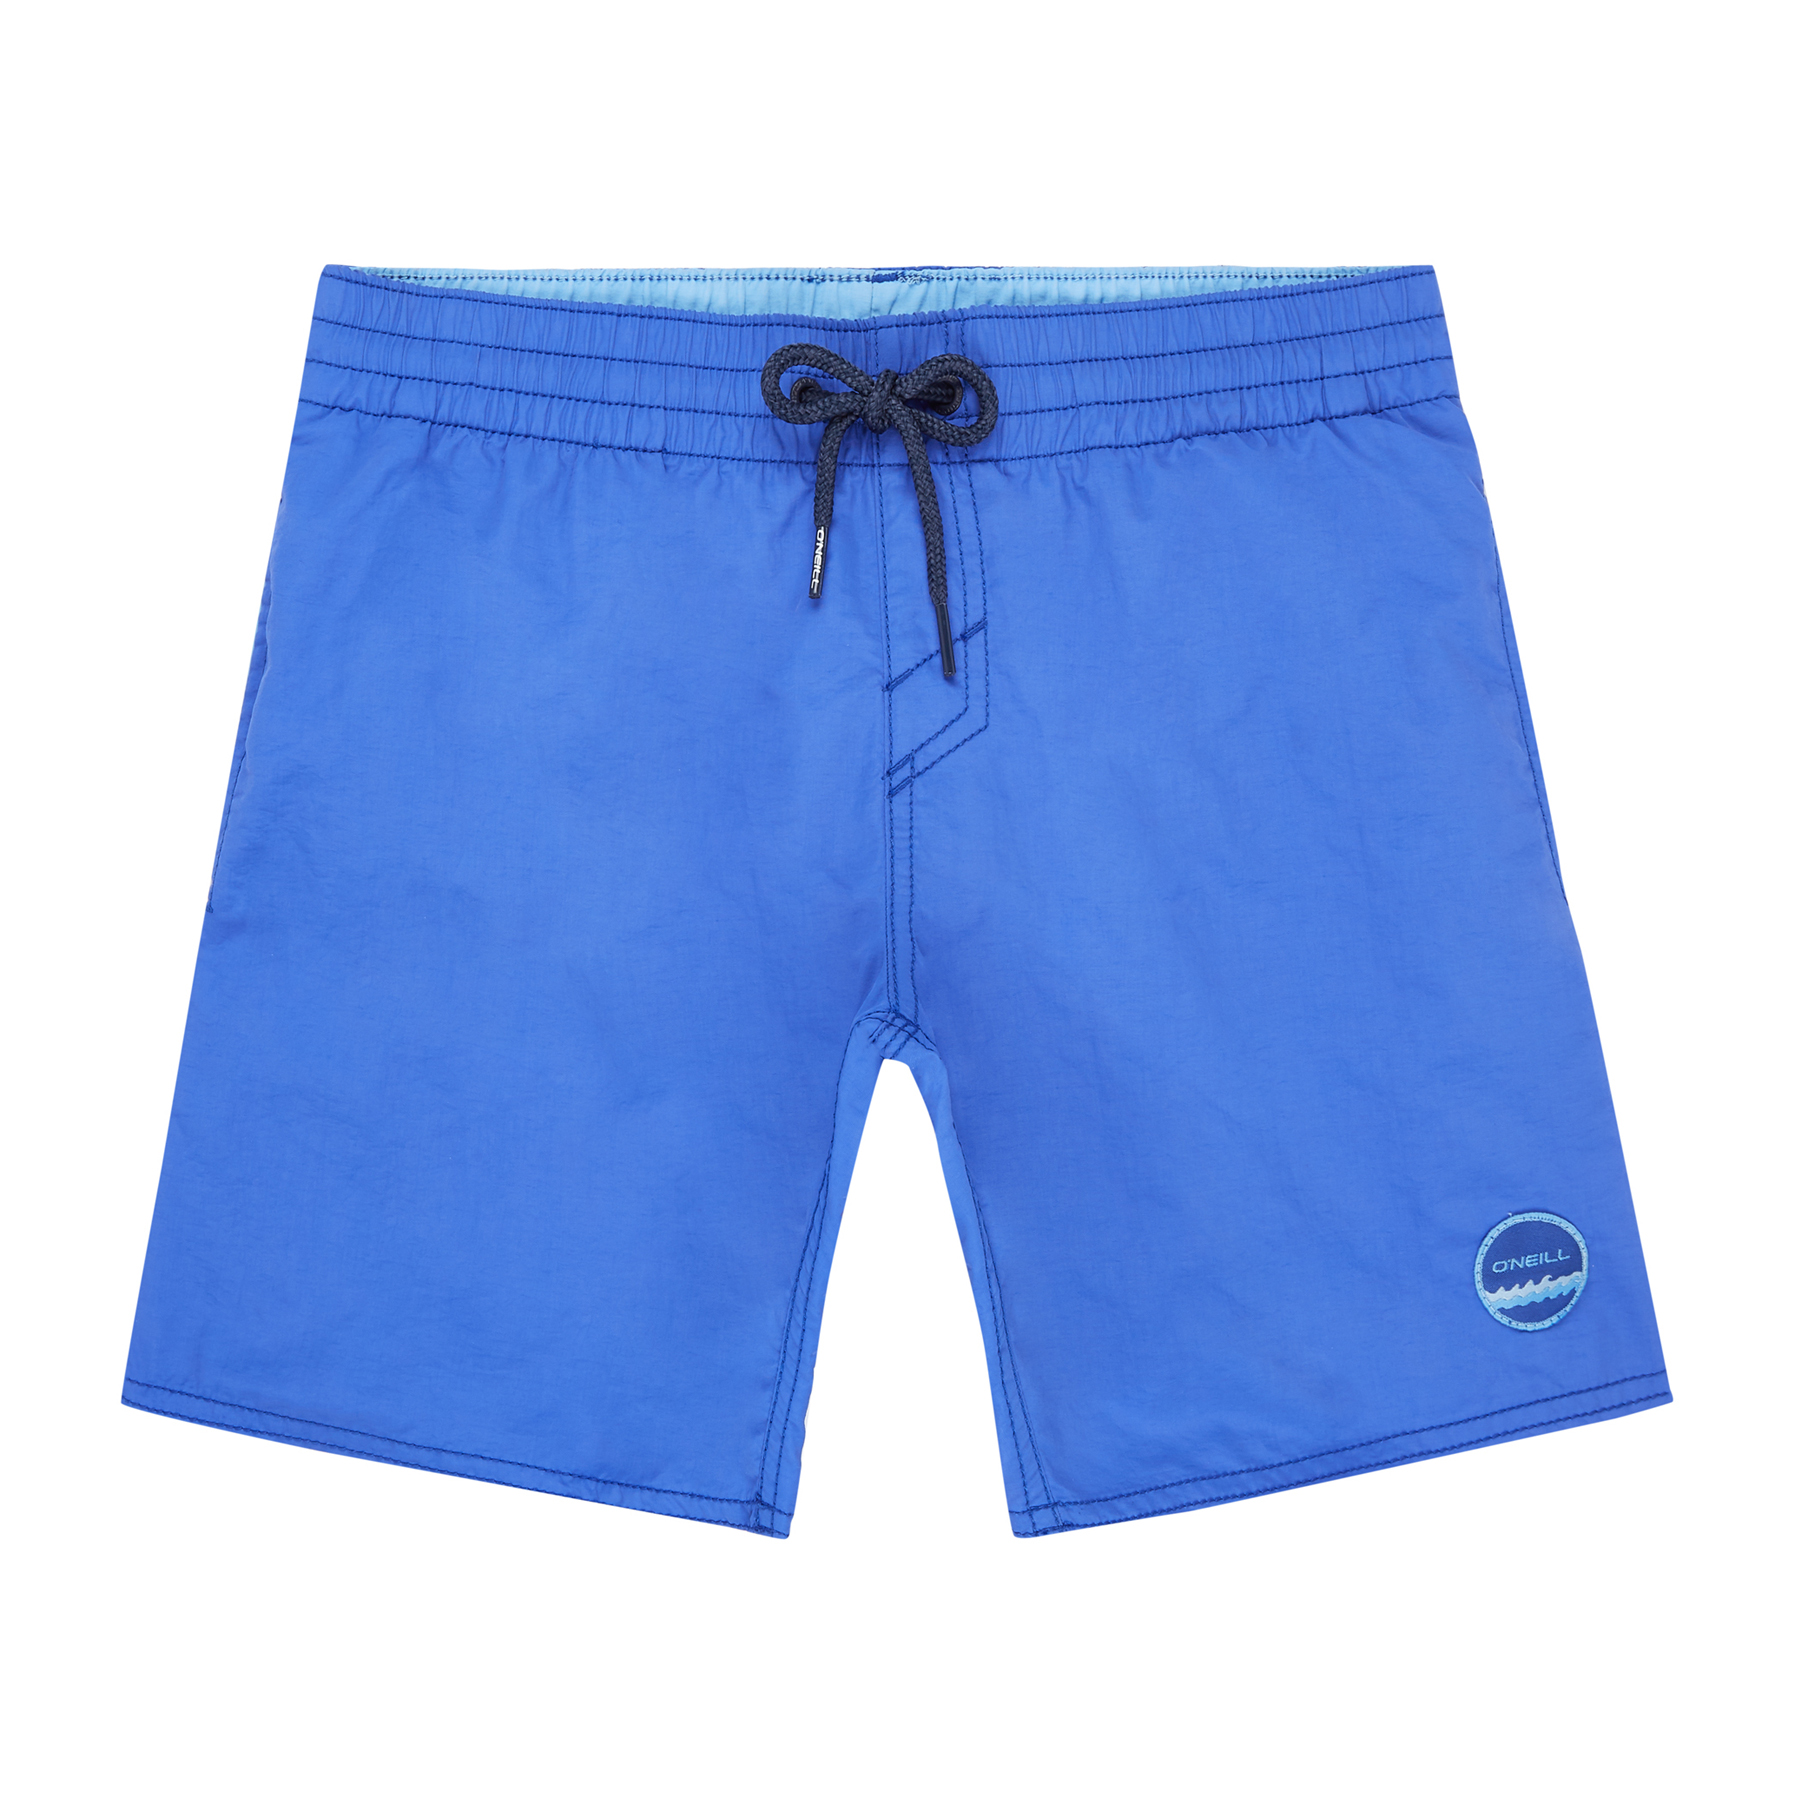 Quiksilver Boys Toddler 3//3T Board Shorts Everyday Down Under Blue Orange